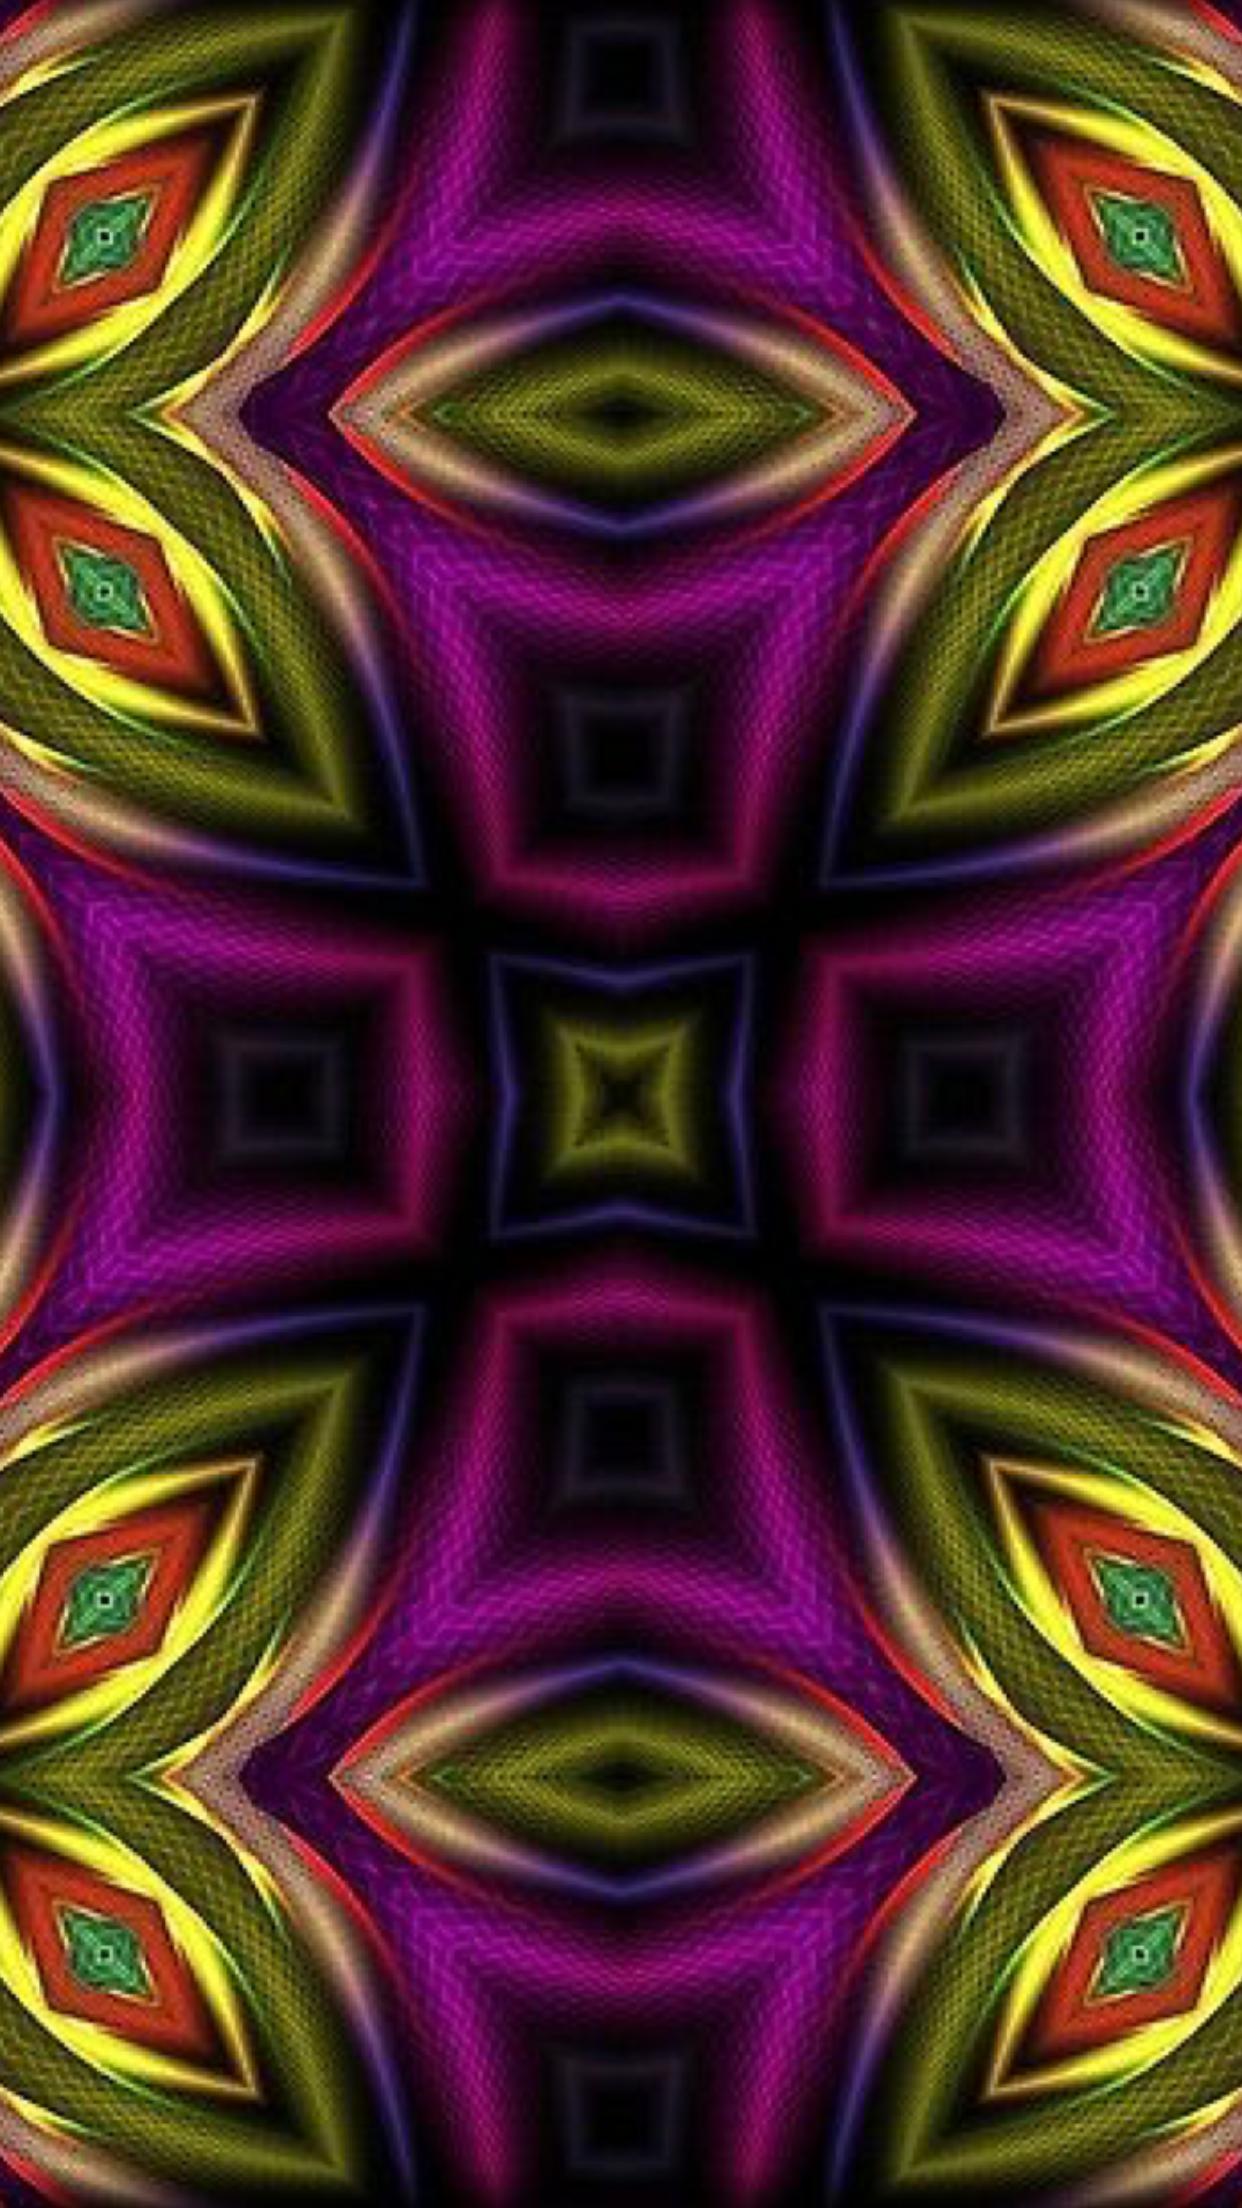 Fractal/Art/Wallpaper IV image by Cathy Watkins Art